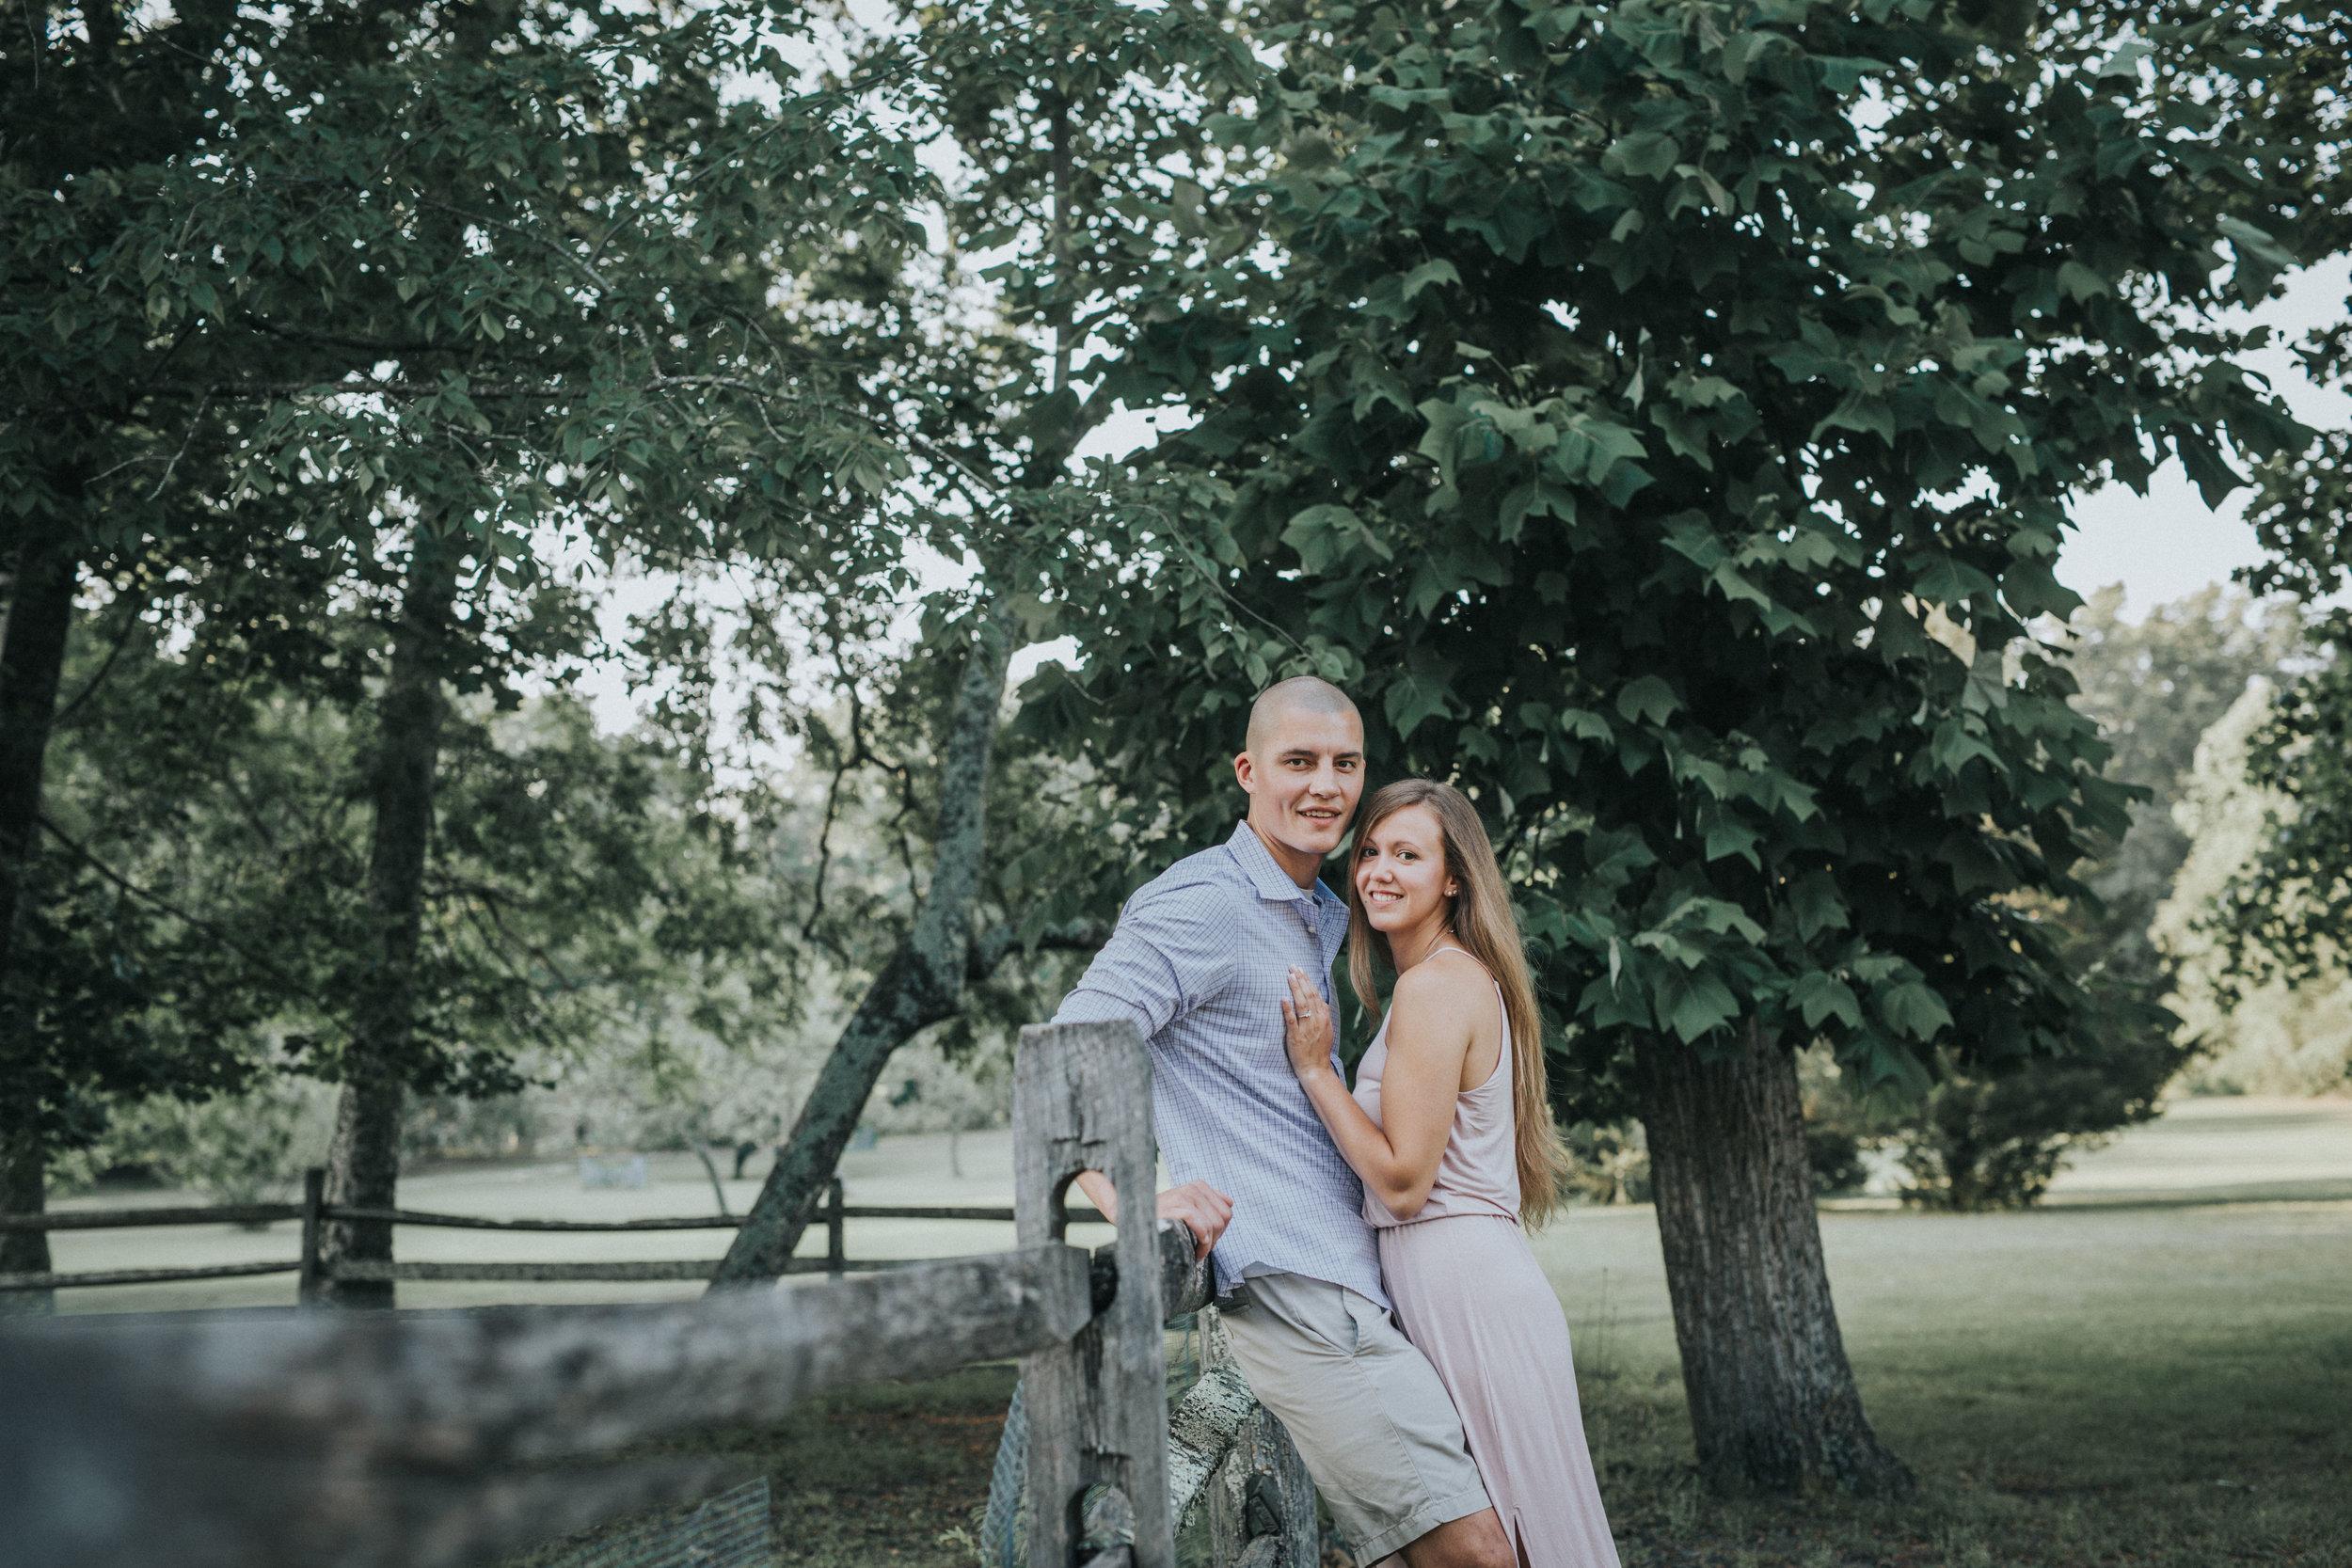 NewJersey_Wedding_Photography_Engagement_Batsto_Village_Sami&Nick-22.jpg